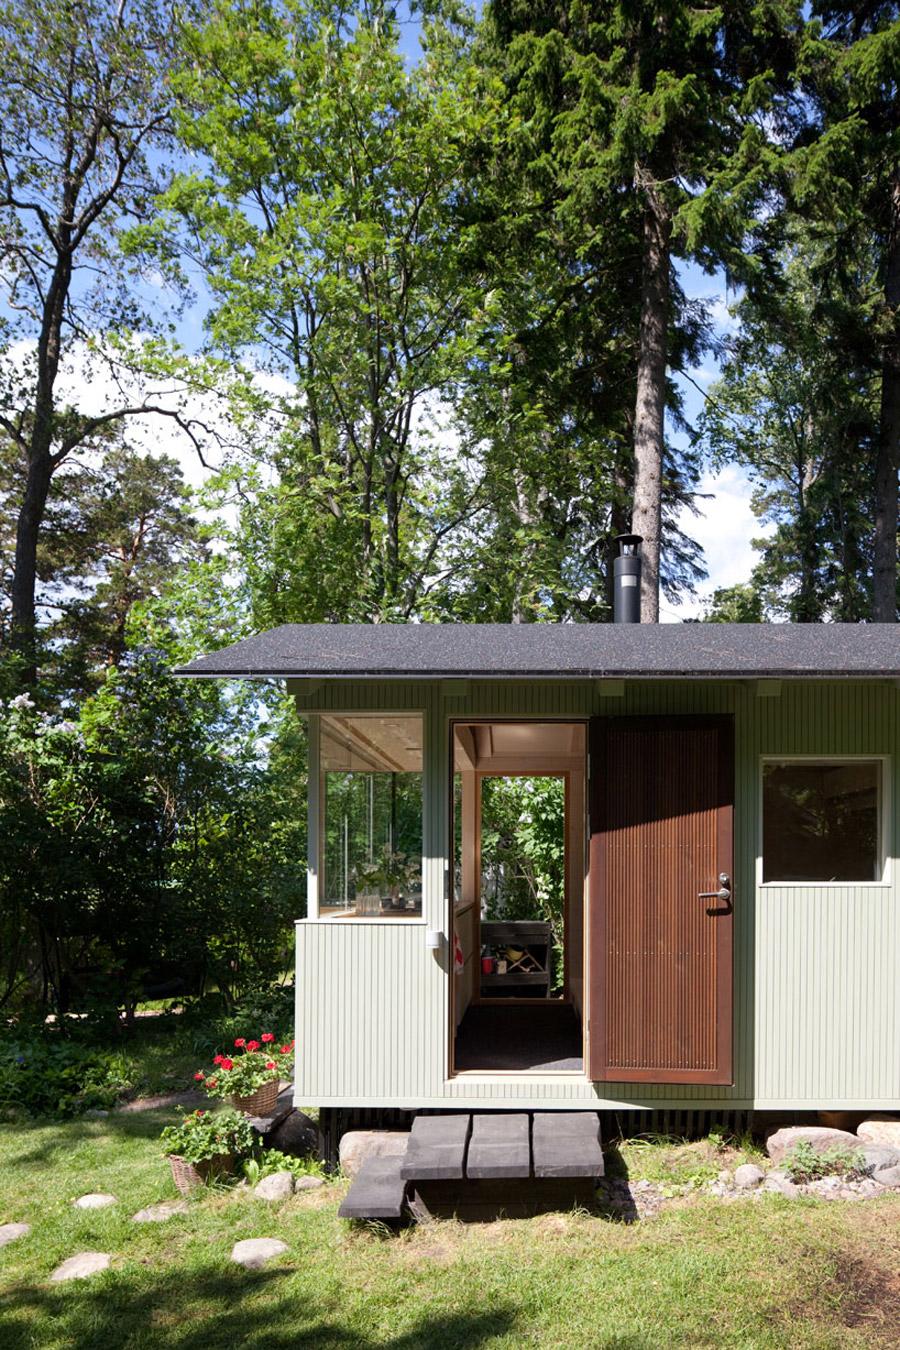 city-cottage-verstas-architects-2